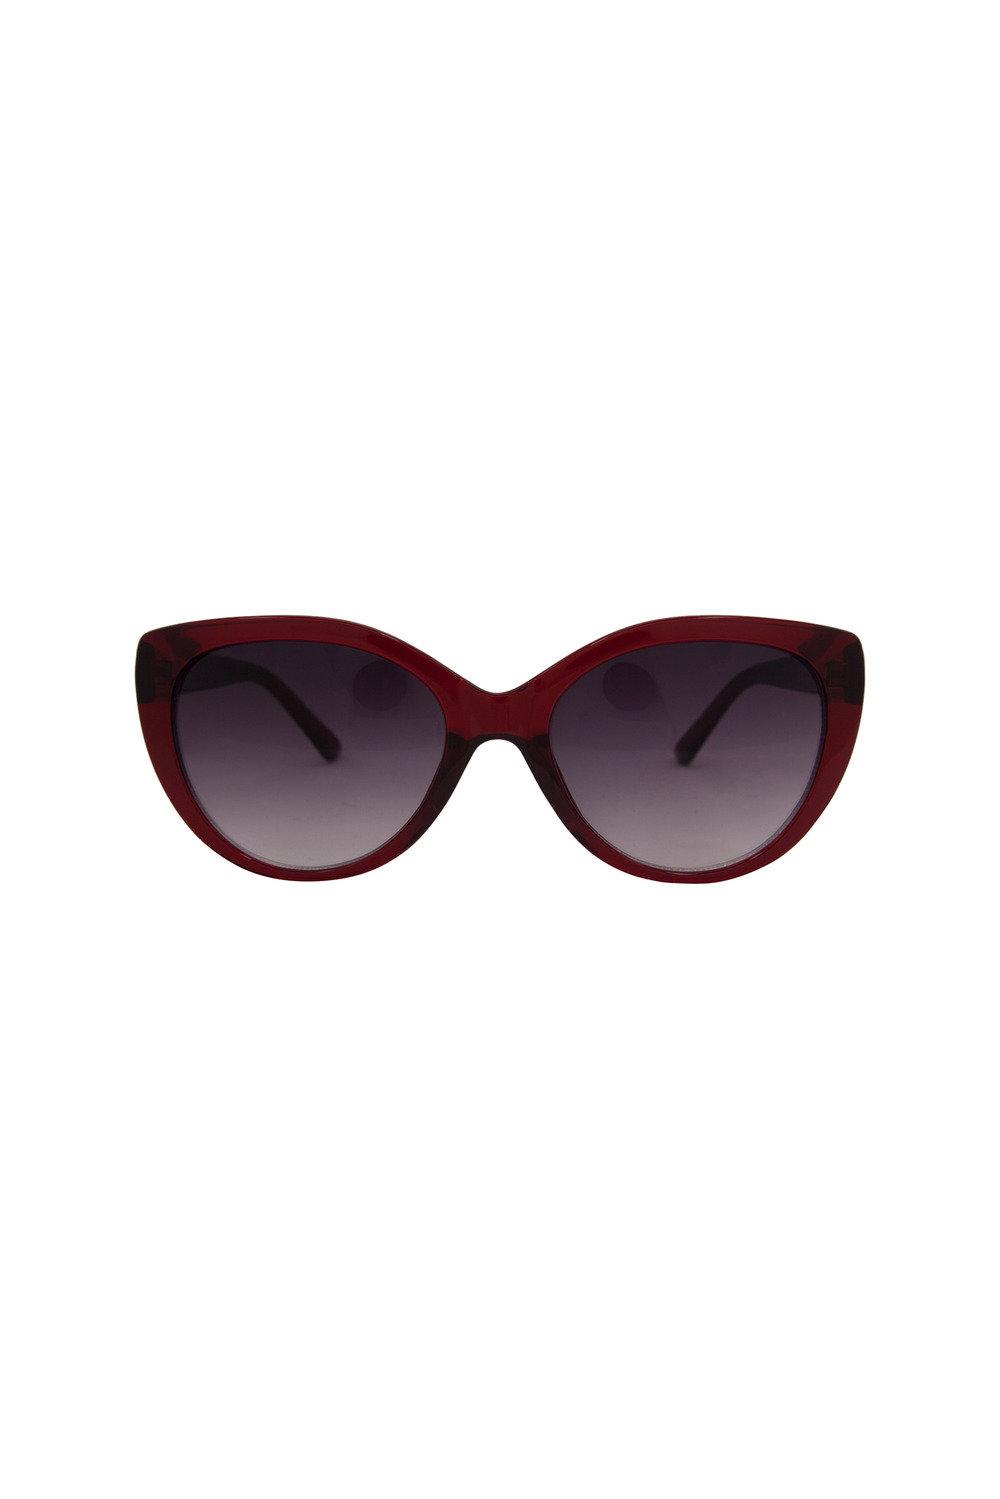 Amber Rose Rosalie Sunglasses Online  f272a2e6f